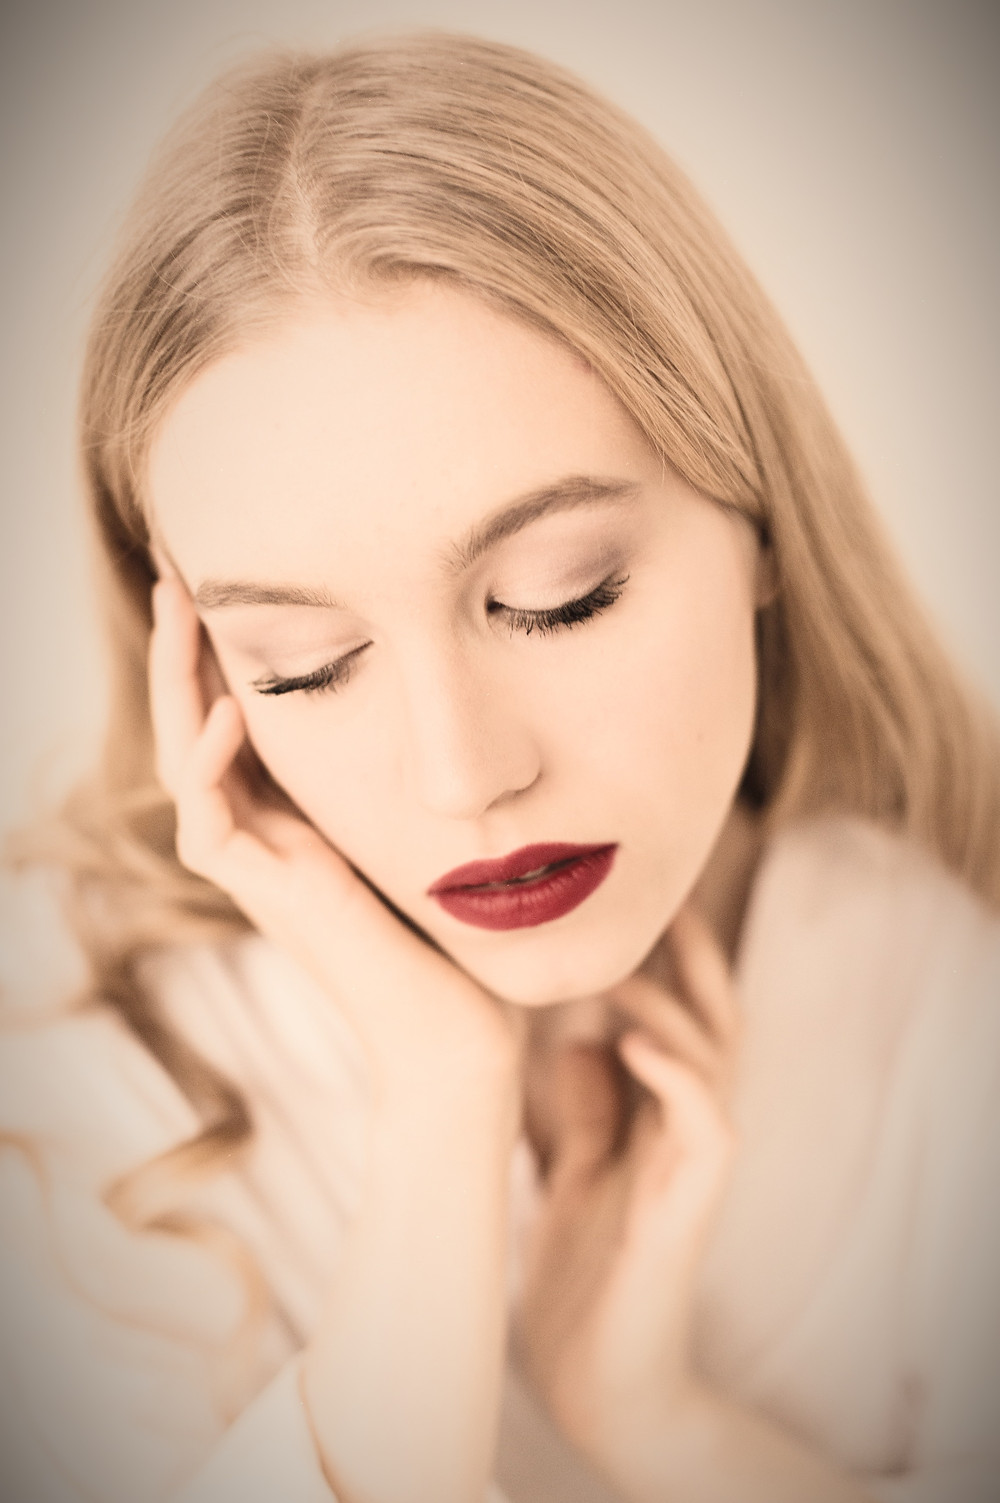 girl, makeup, girl with makeup on, red lipstick. smokey eye, blonde hair